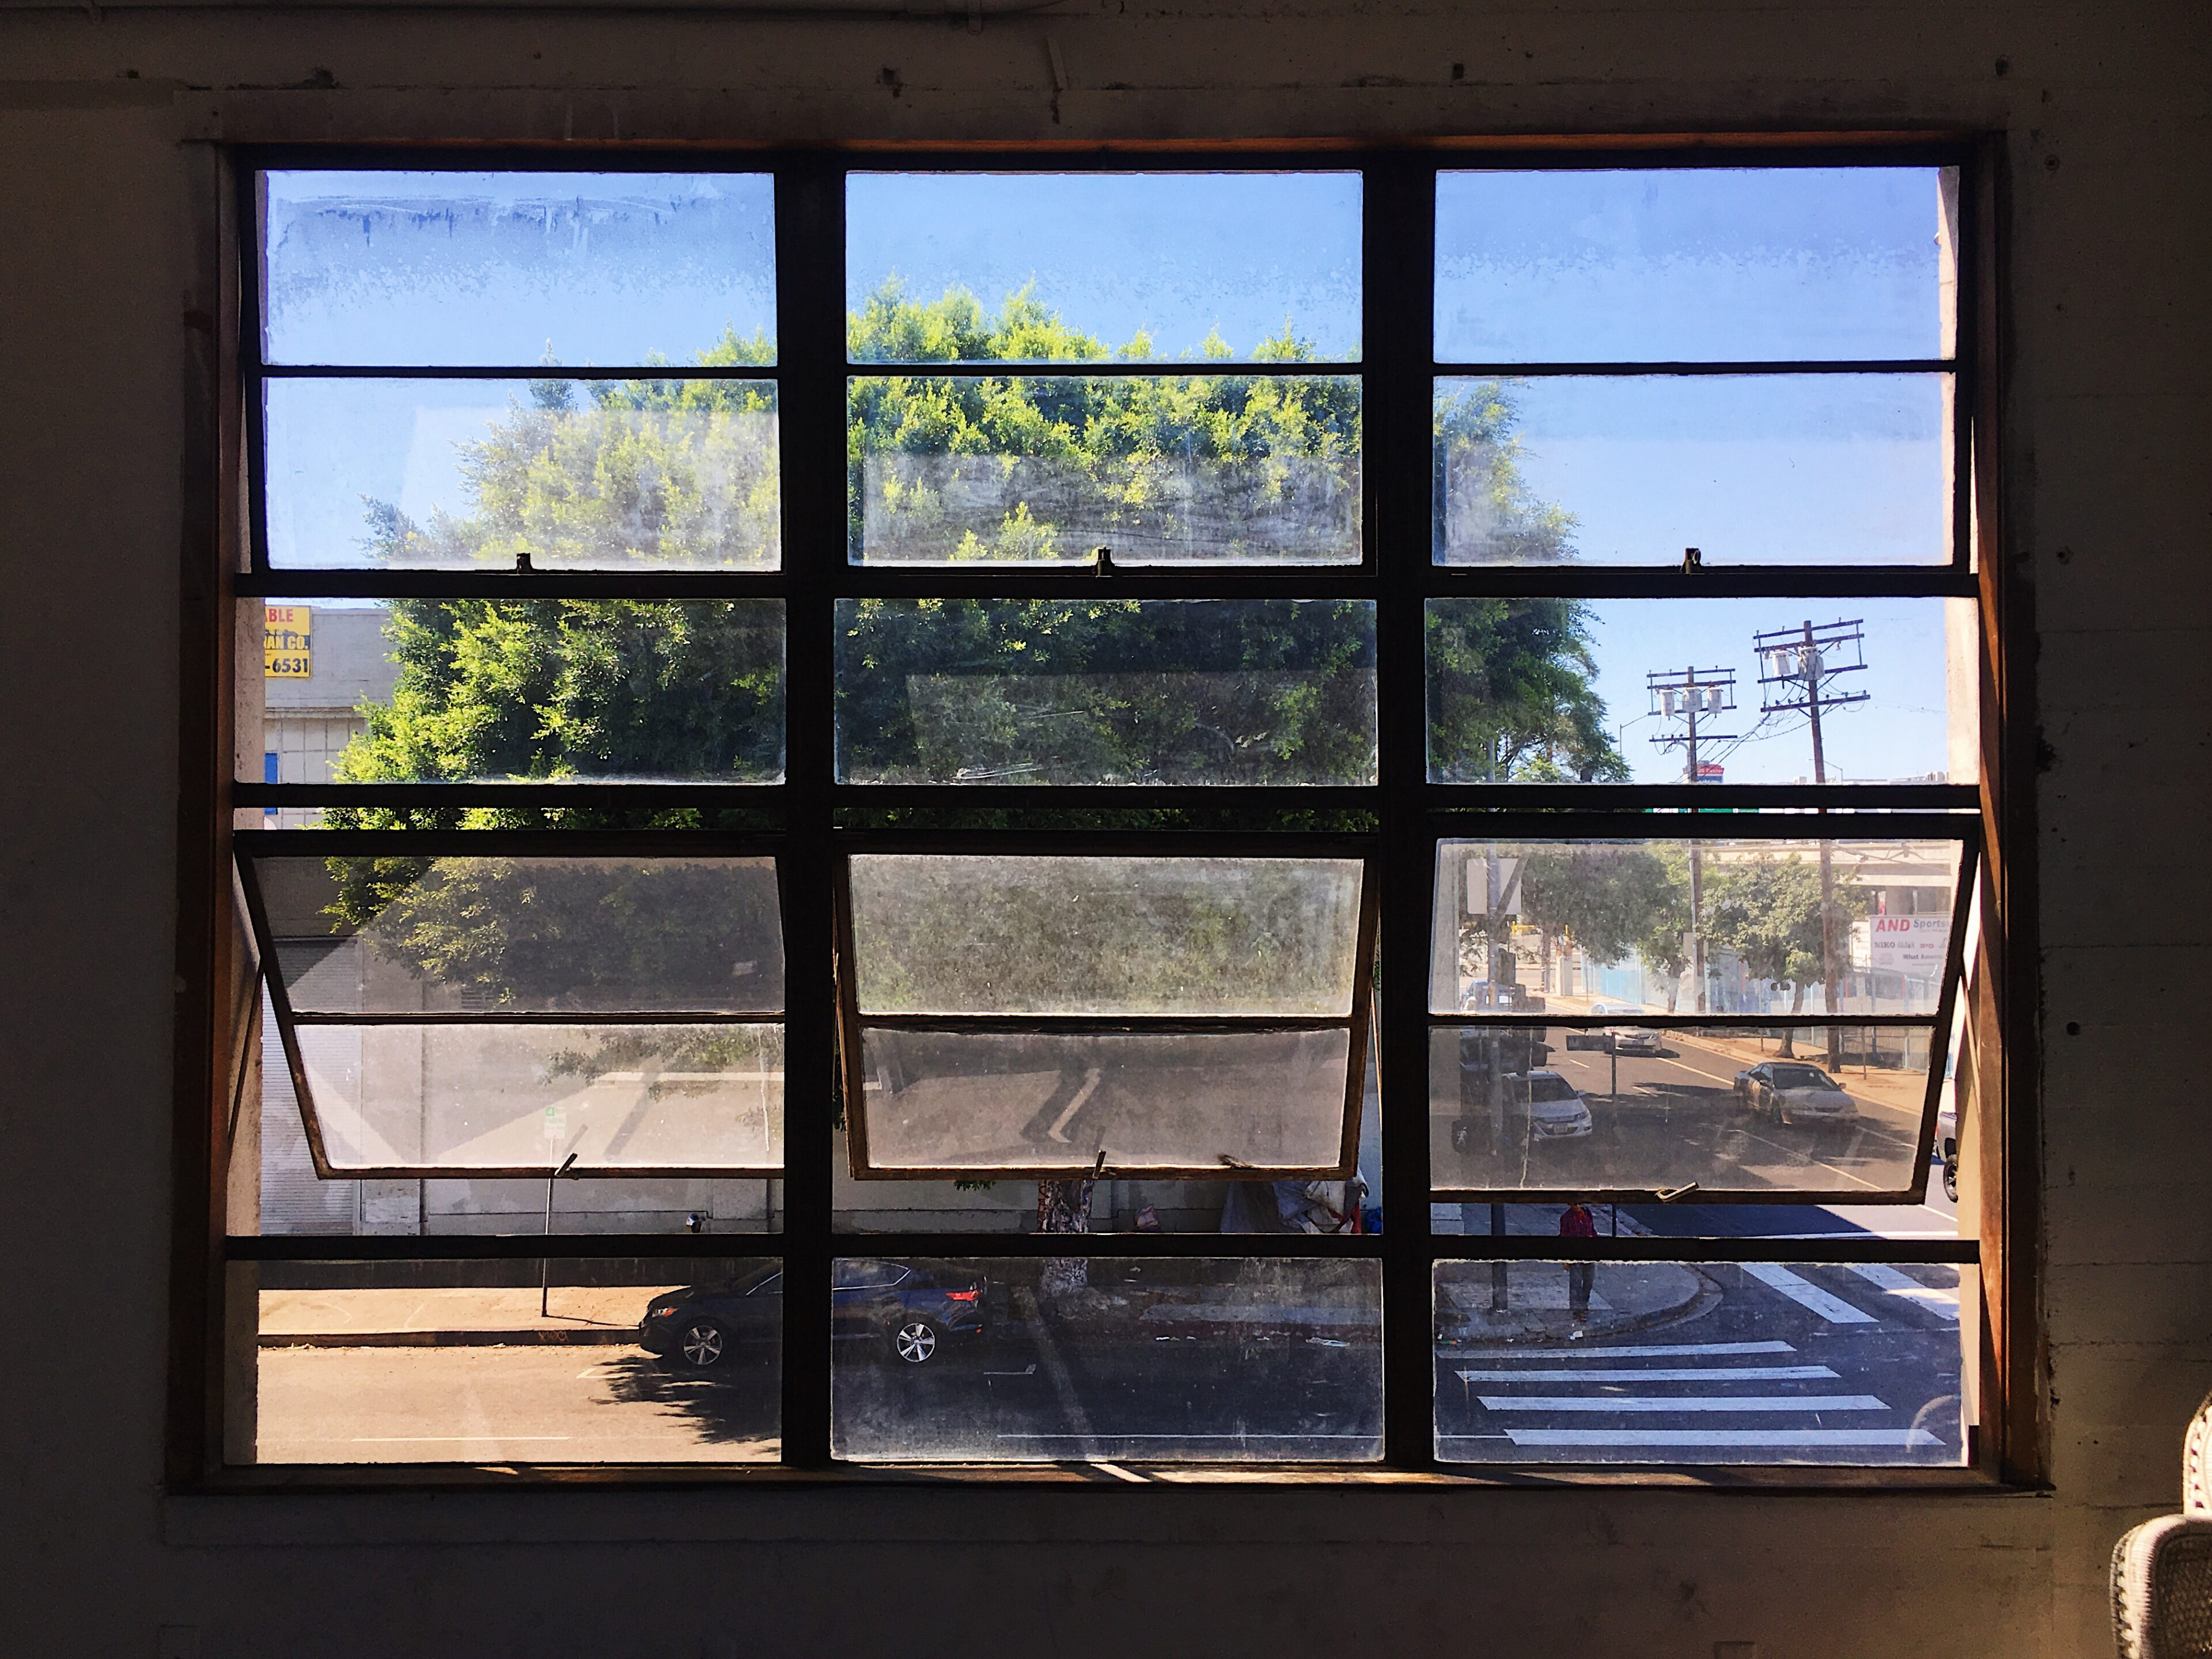 fd photo studio-los angeles-live clothes minded-window